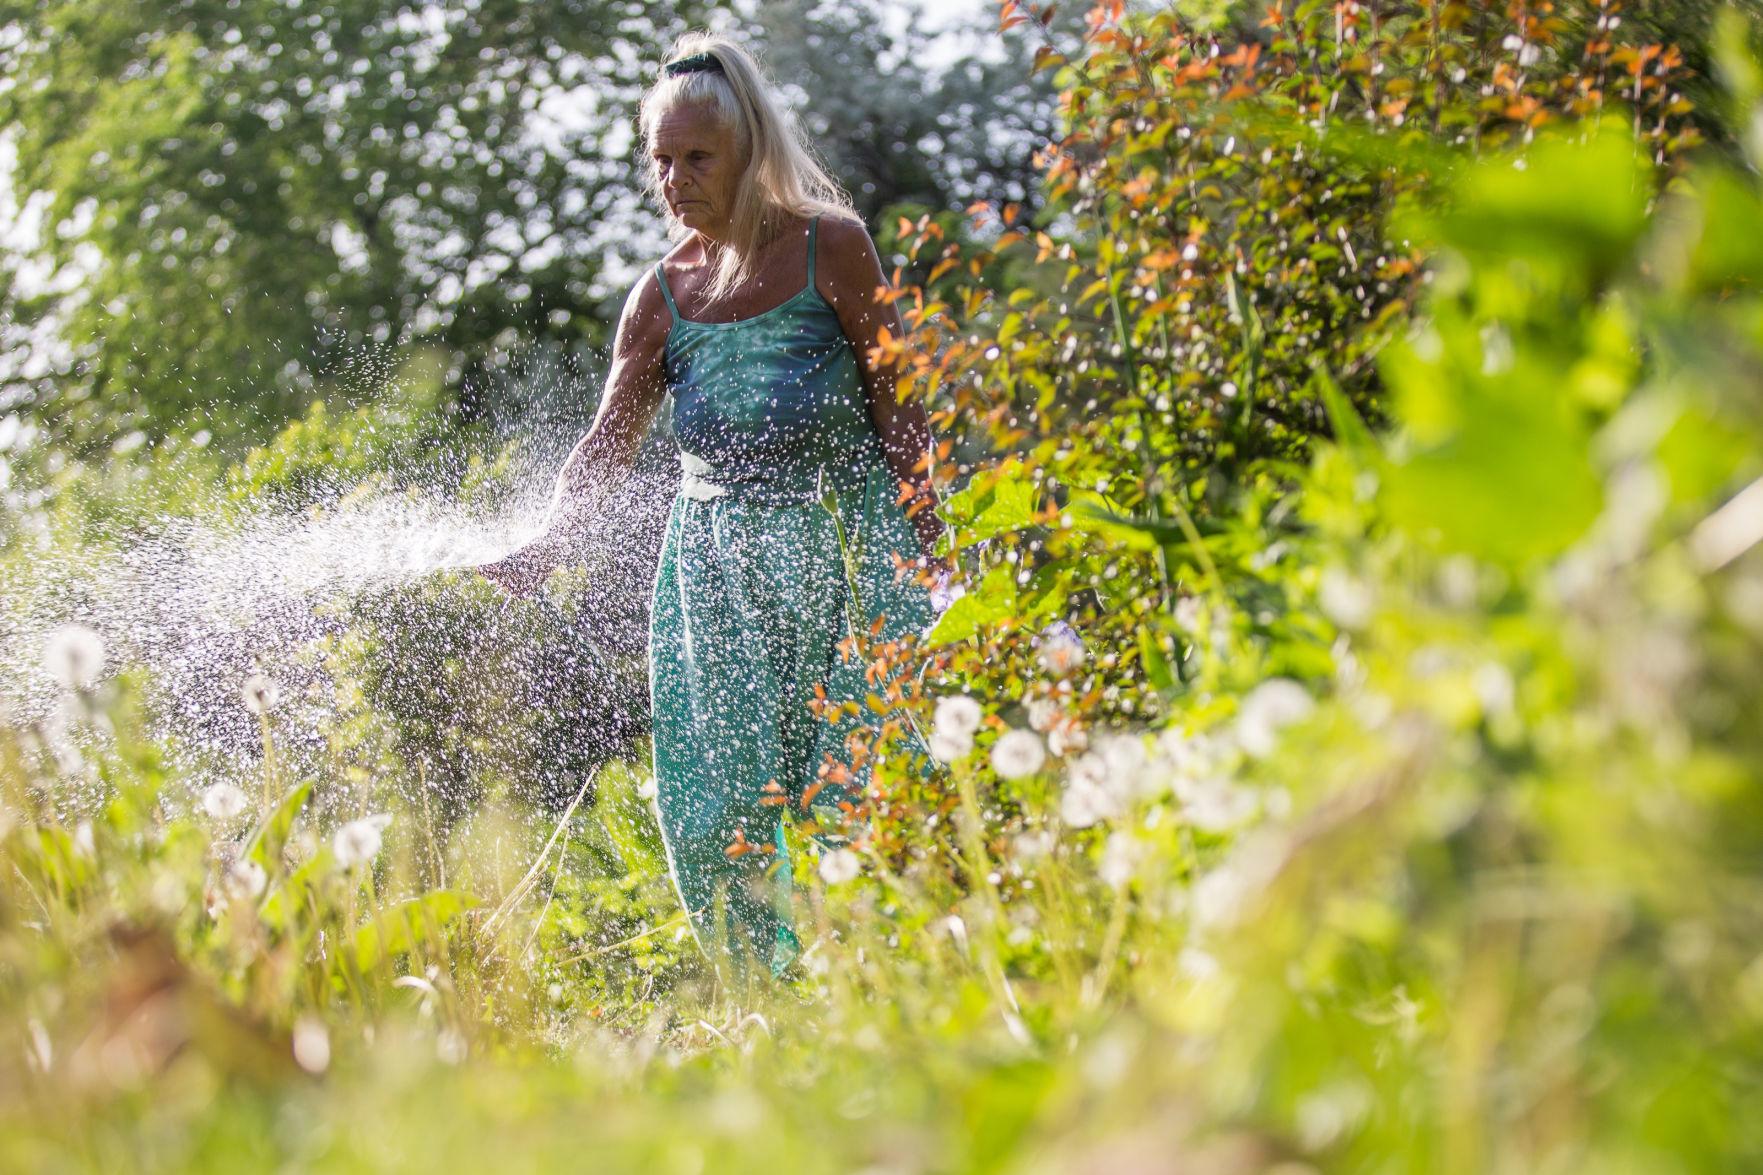 Lynn Cosmos in her Garden